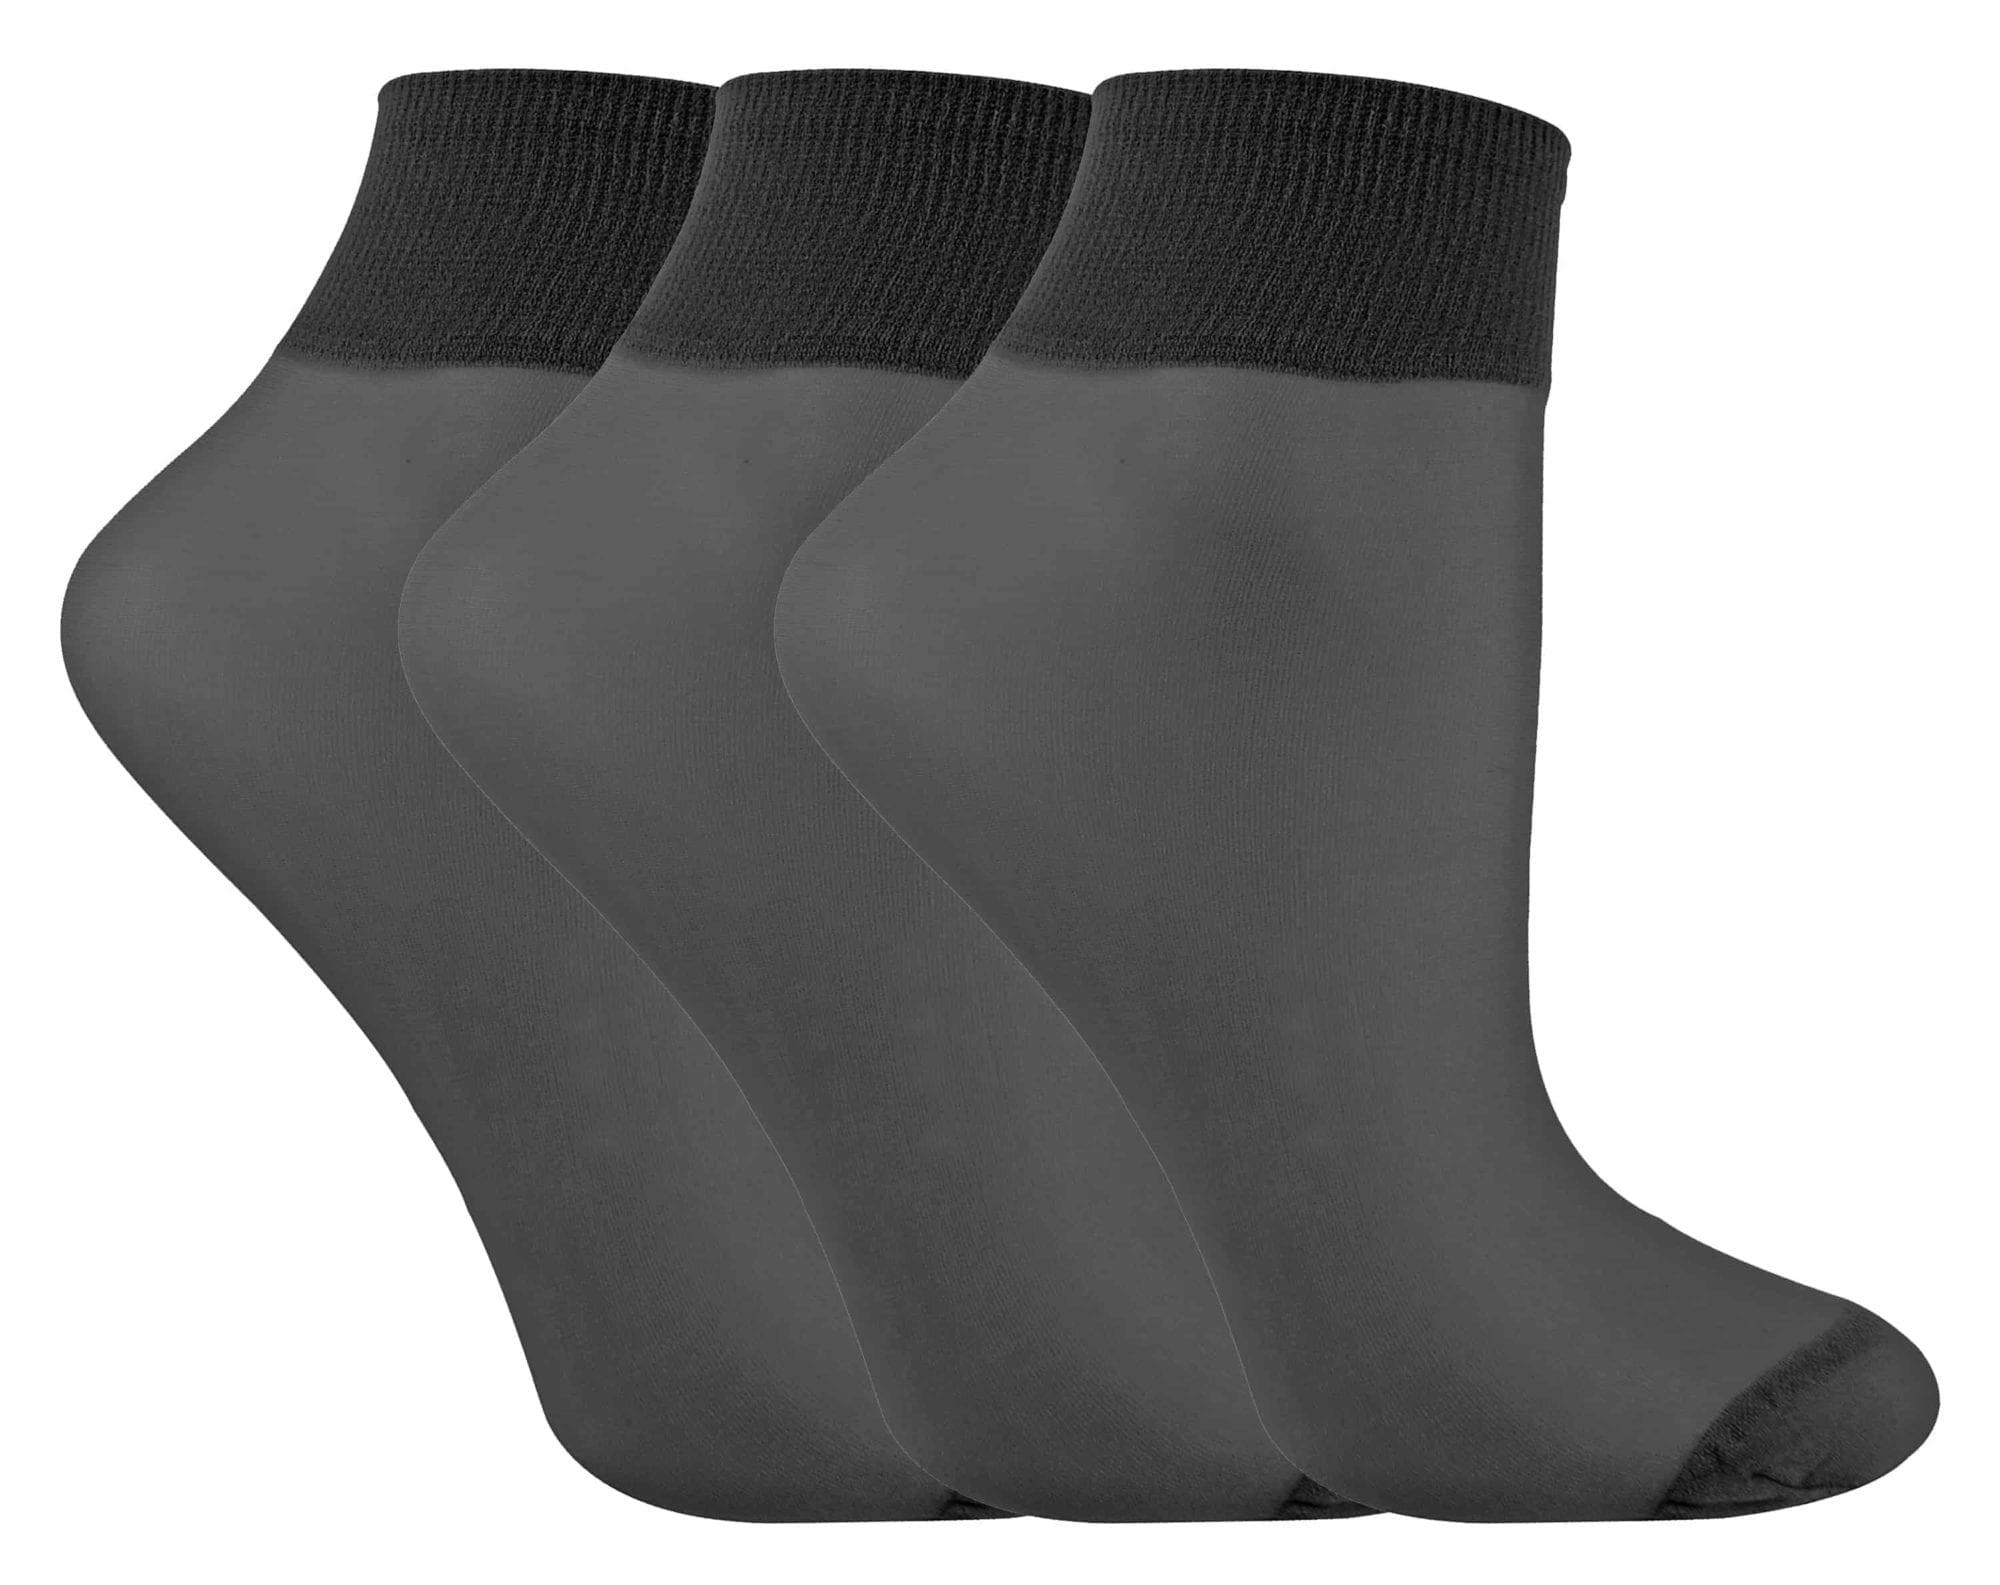 Ankle High Pop Socks in Black by LIVIA